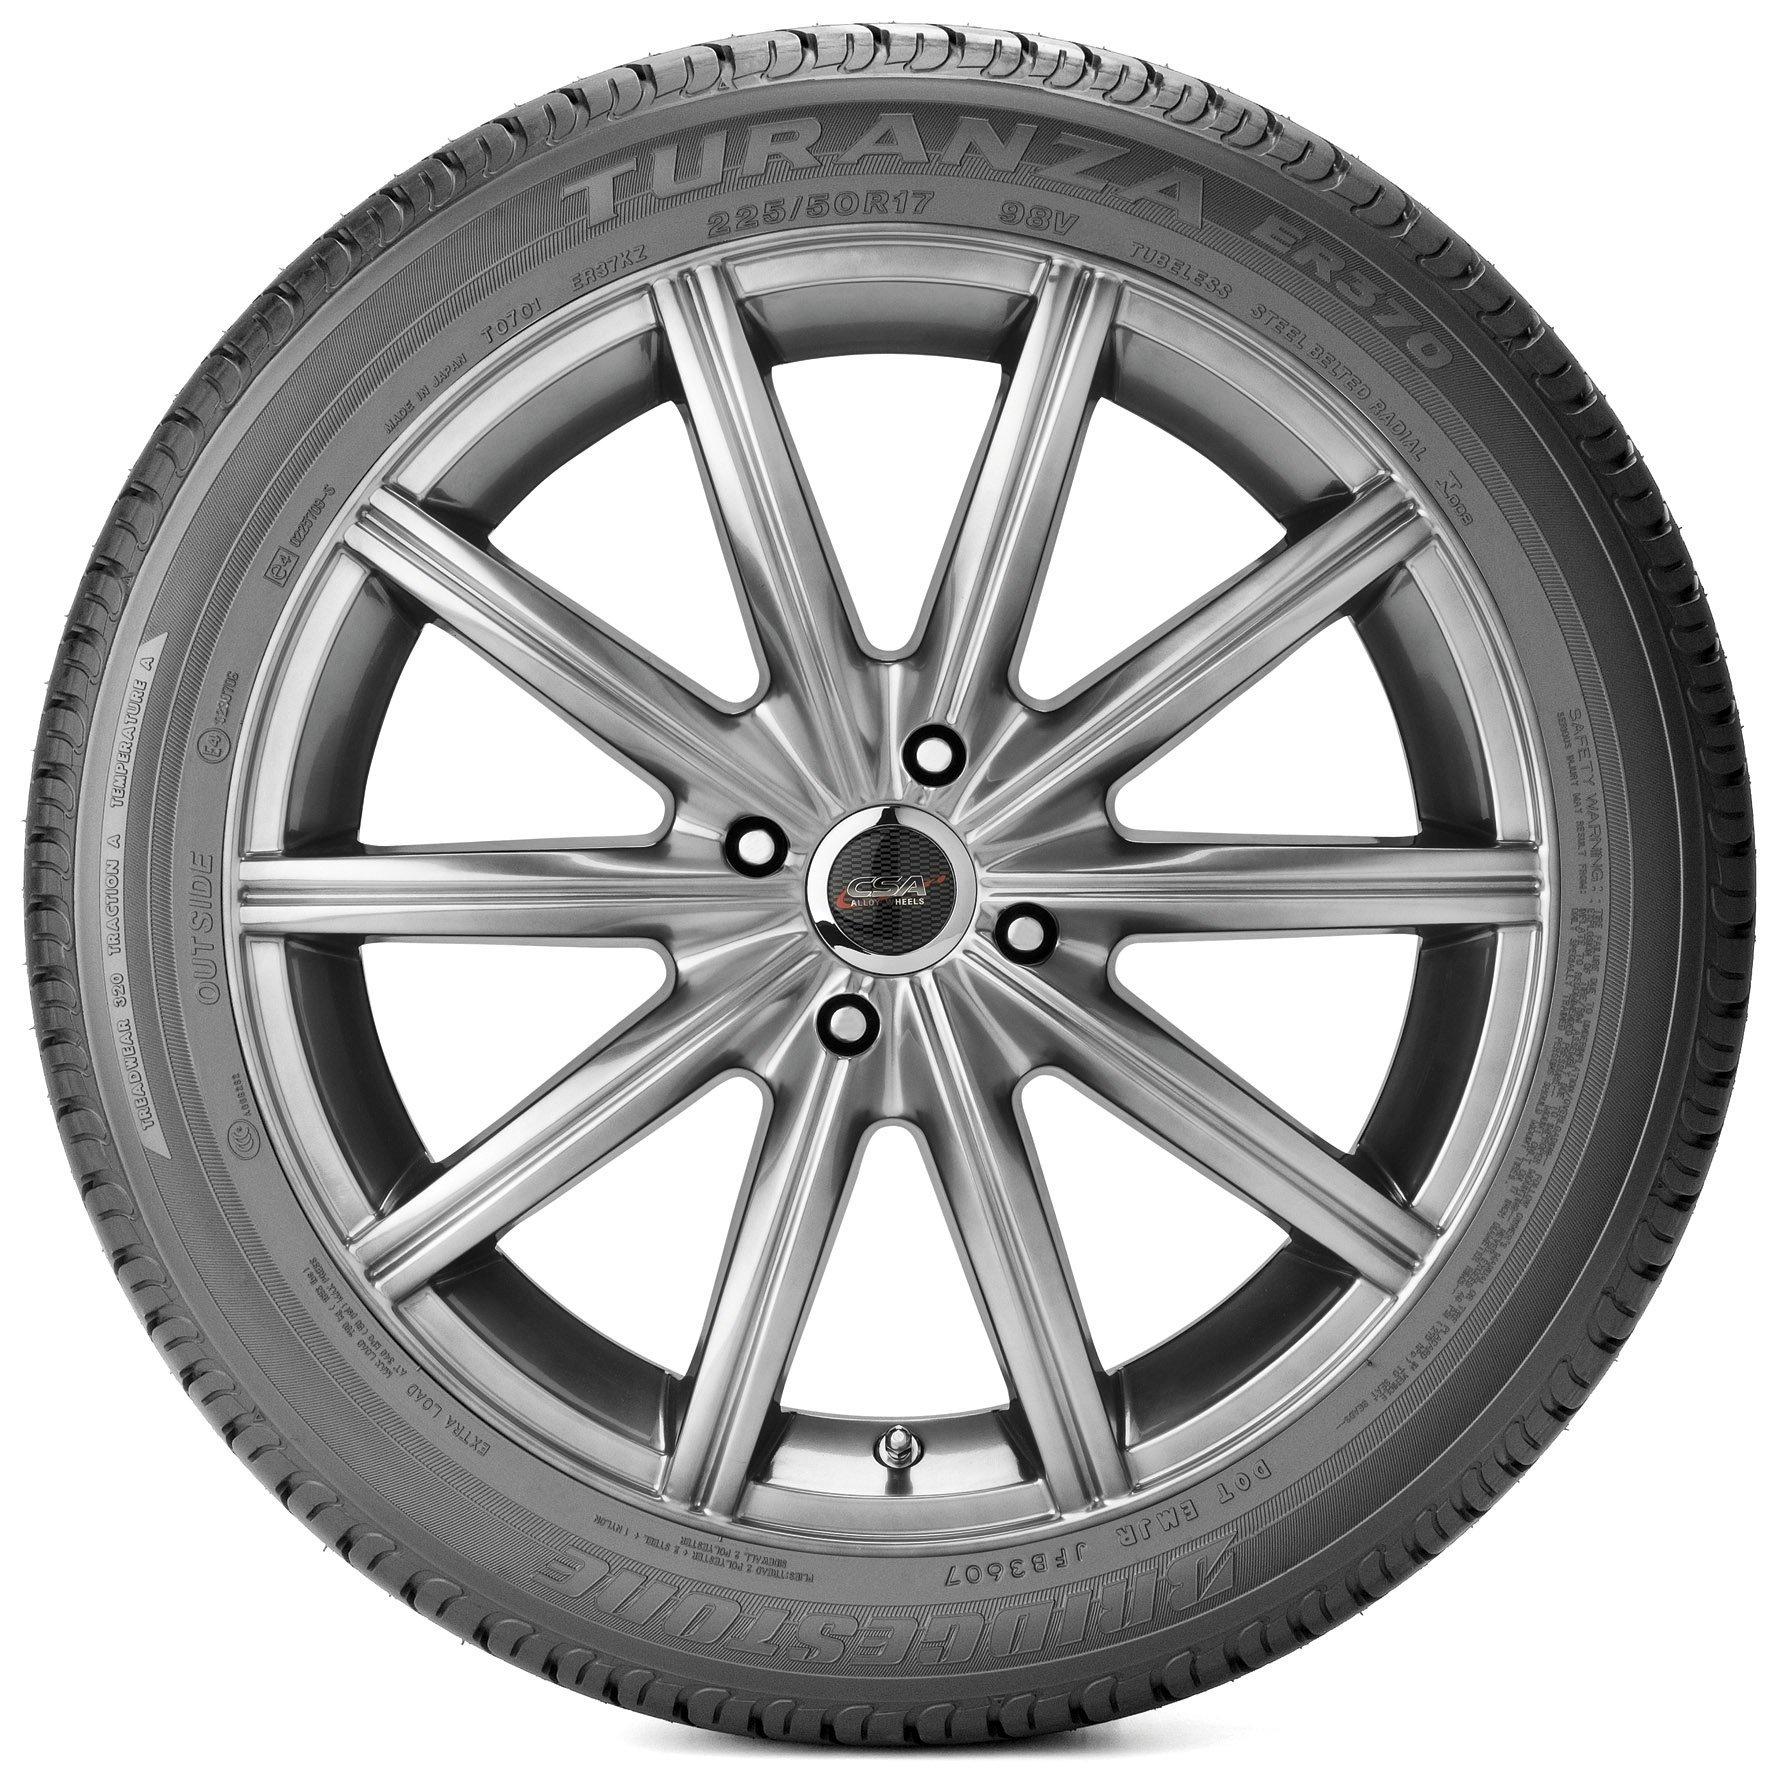 Bridgestone ER370 touring tyre special